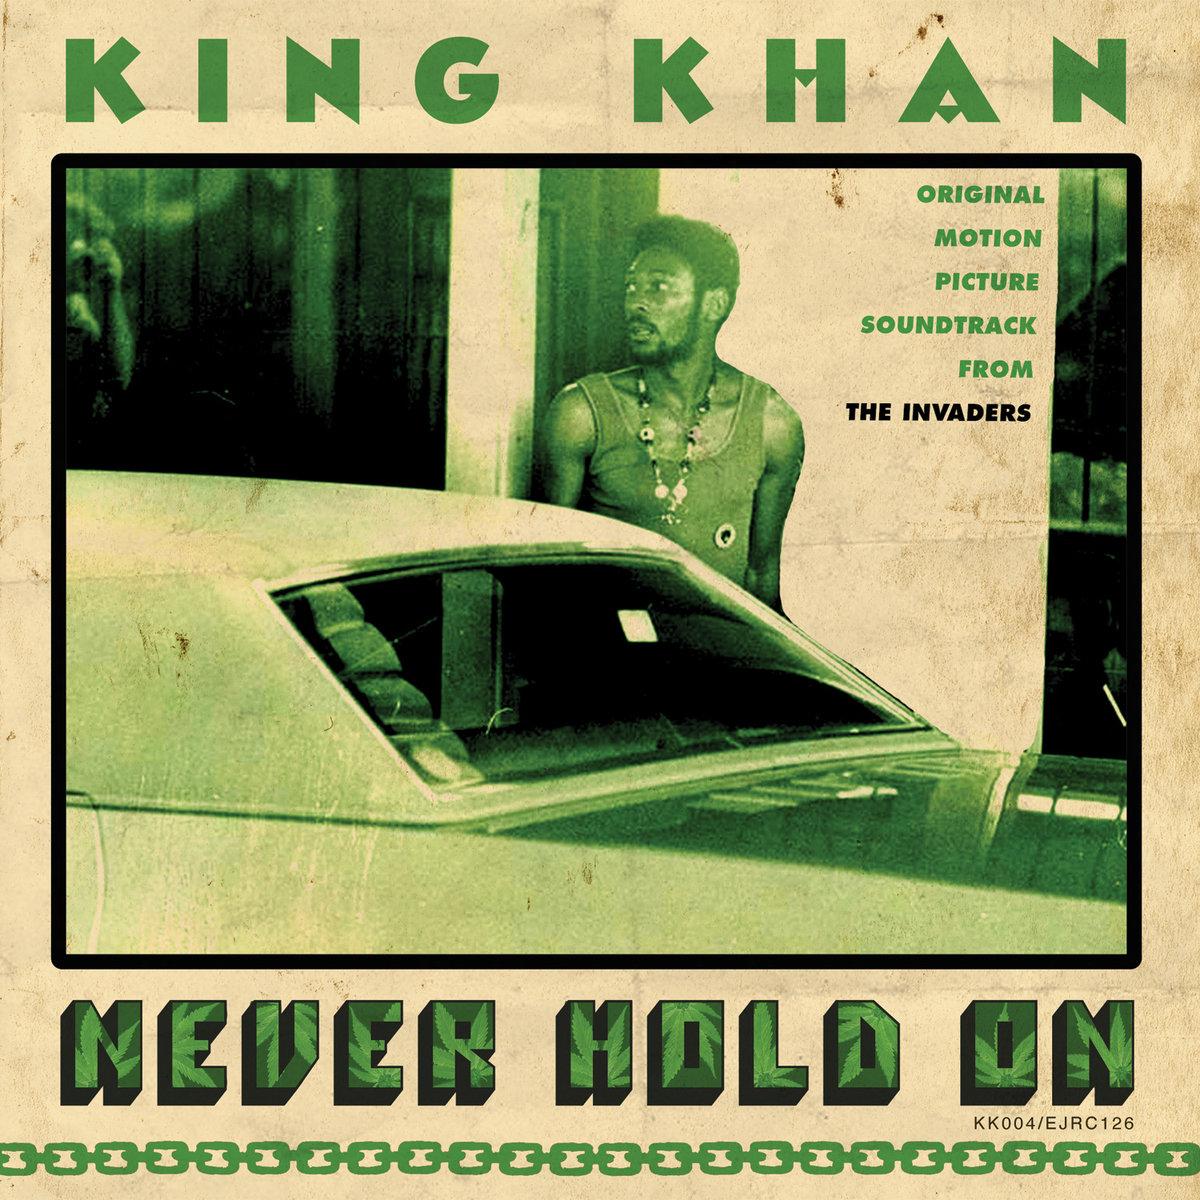 King Khan - Never Hold On b/w A Tree Not A Leaf Am I 7